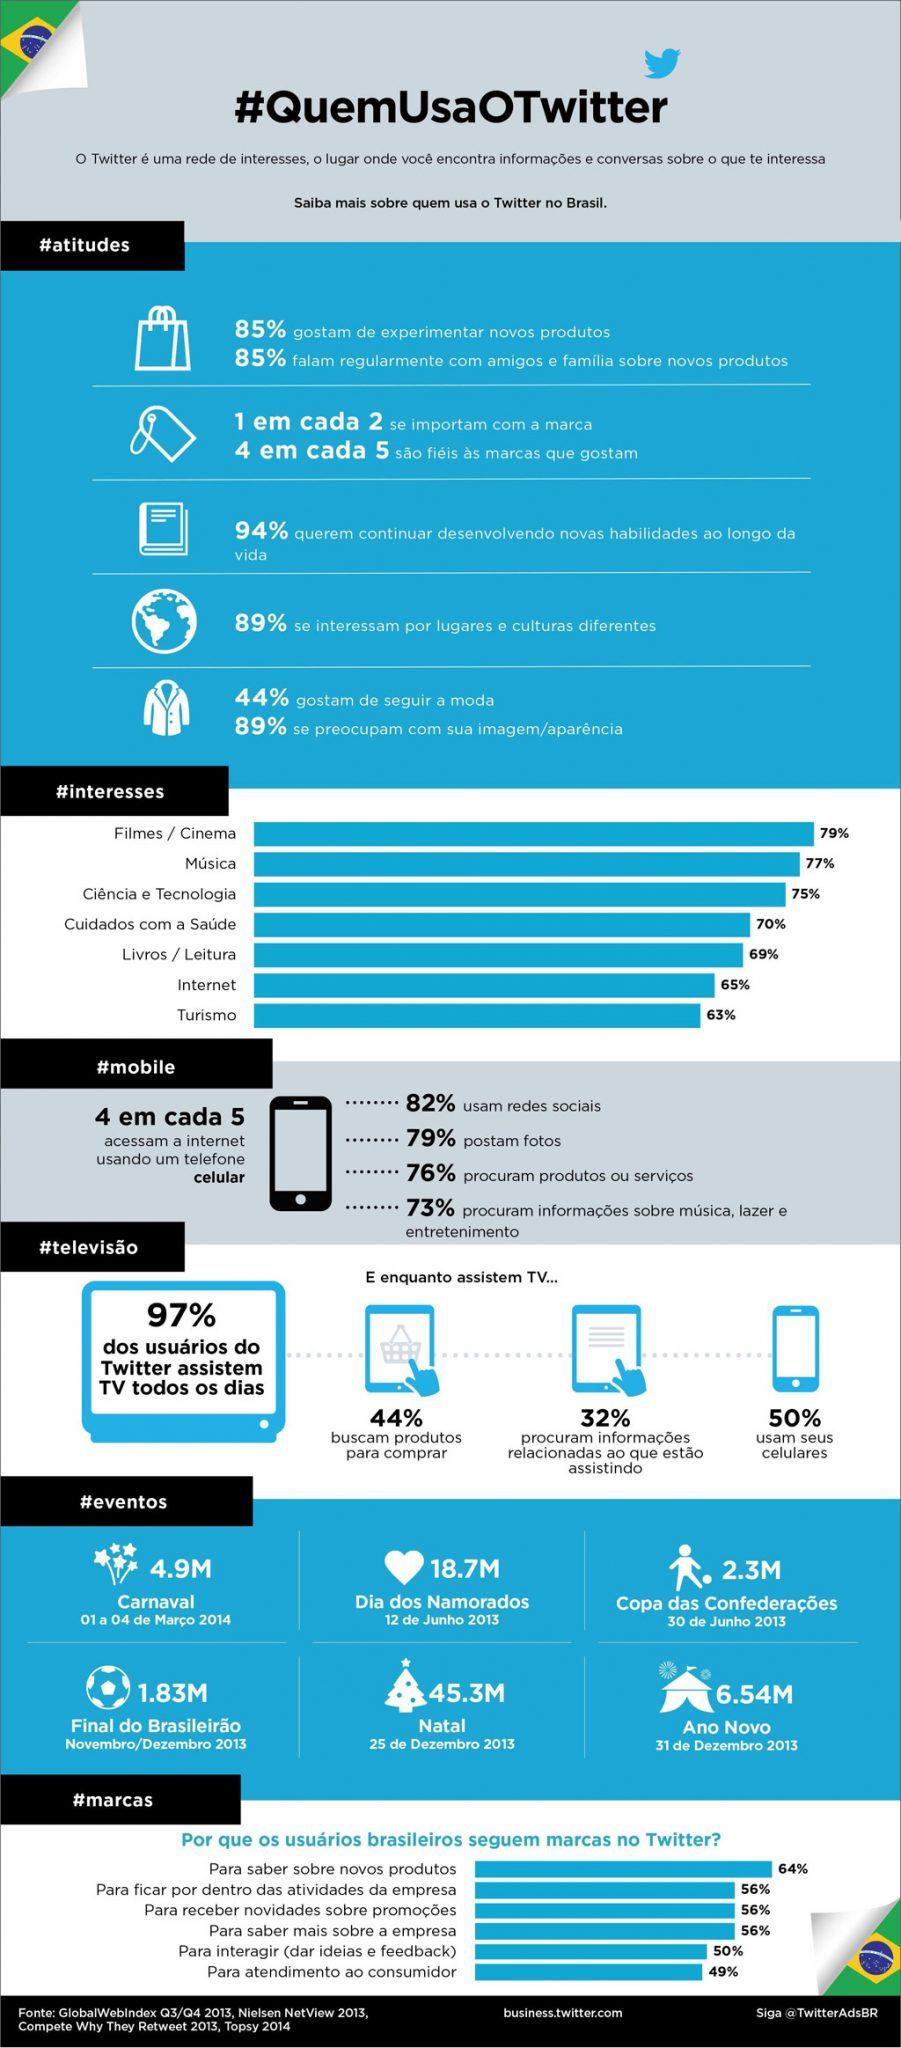 quem-usa-twitter-brasil-dados-infografico